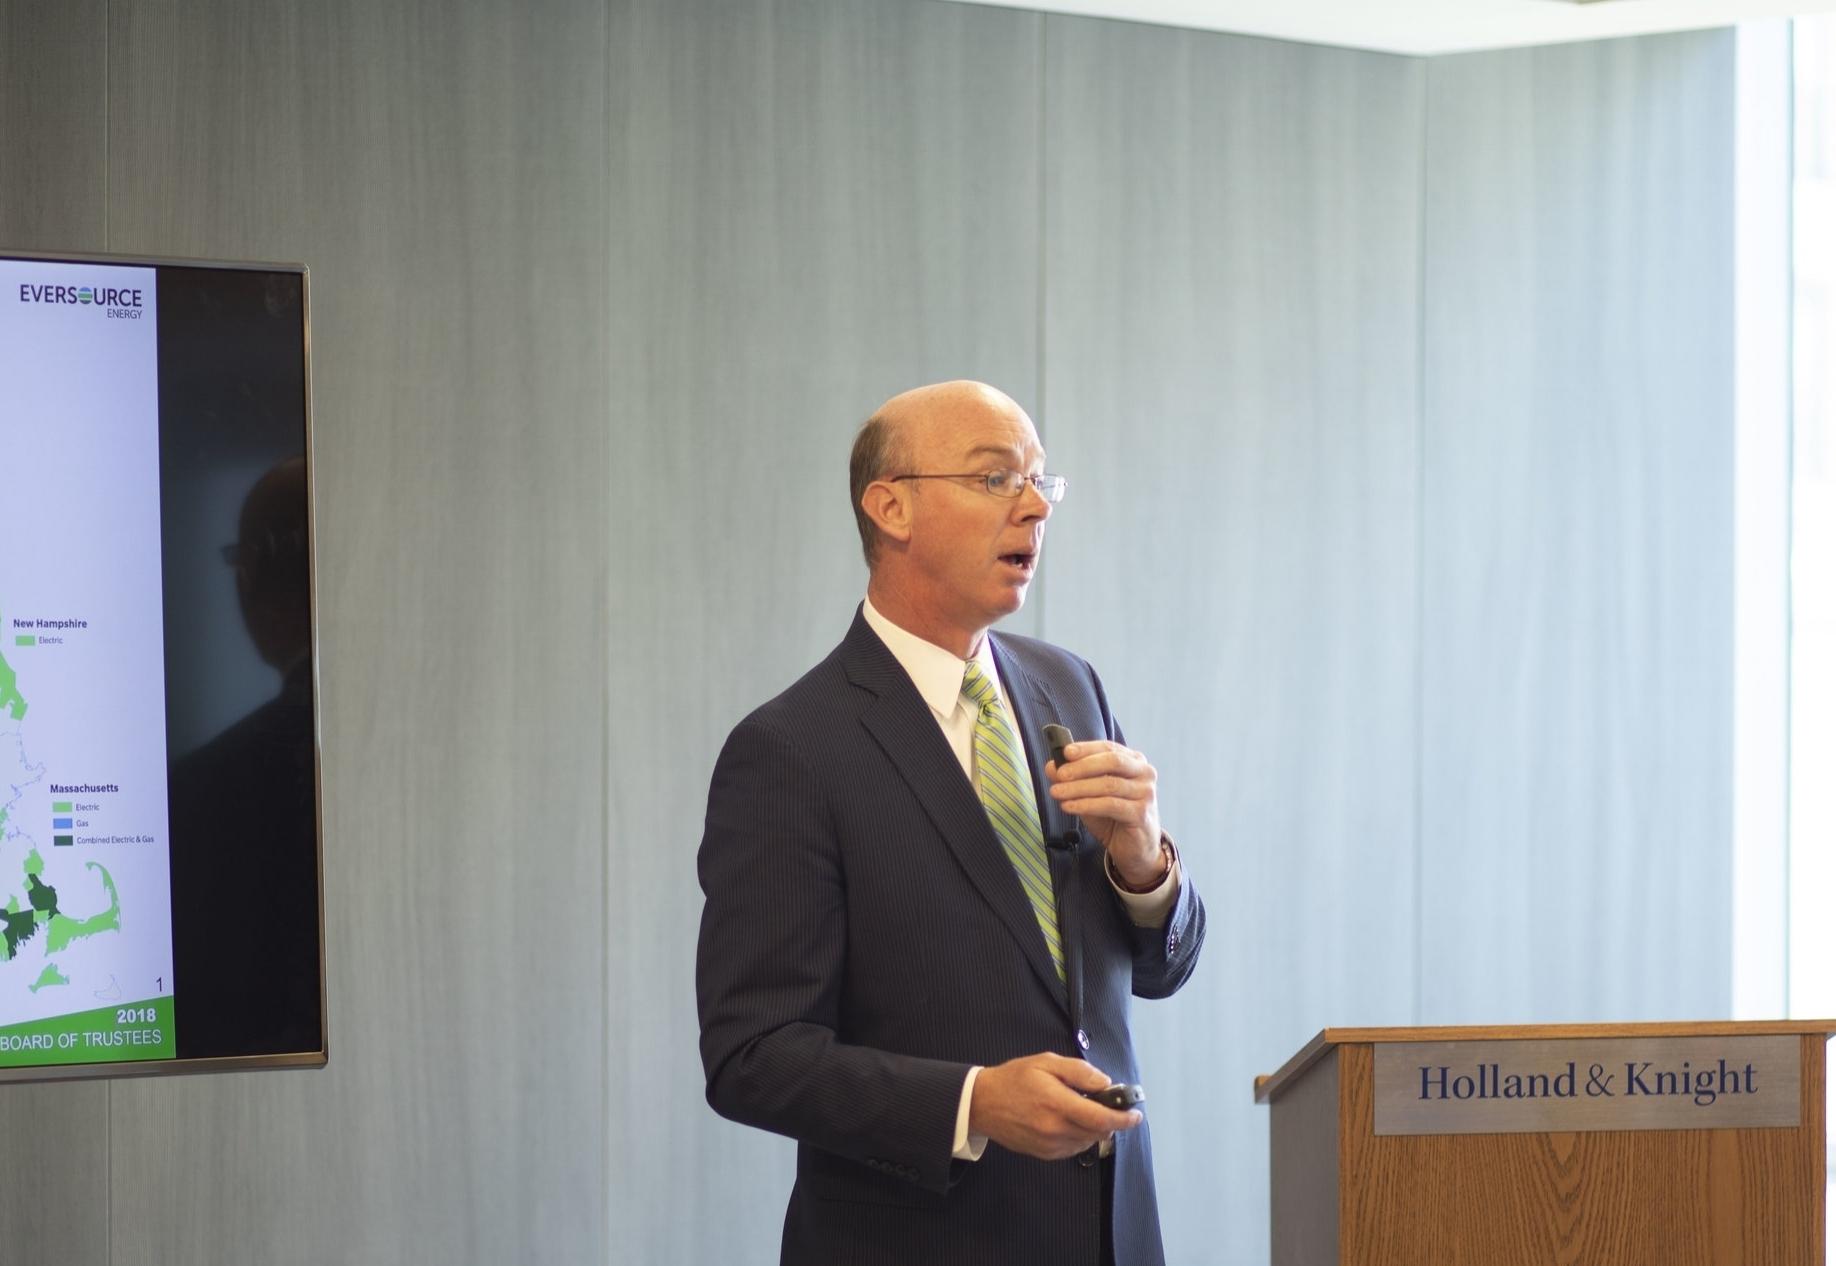 Jim Hunt, SVP, Eversource Energy